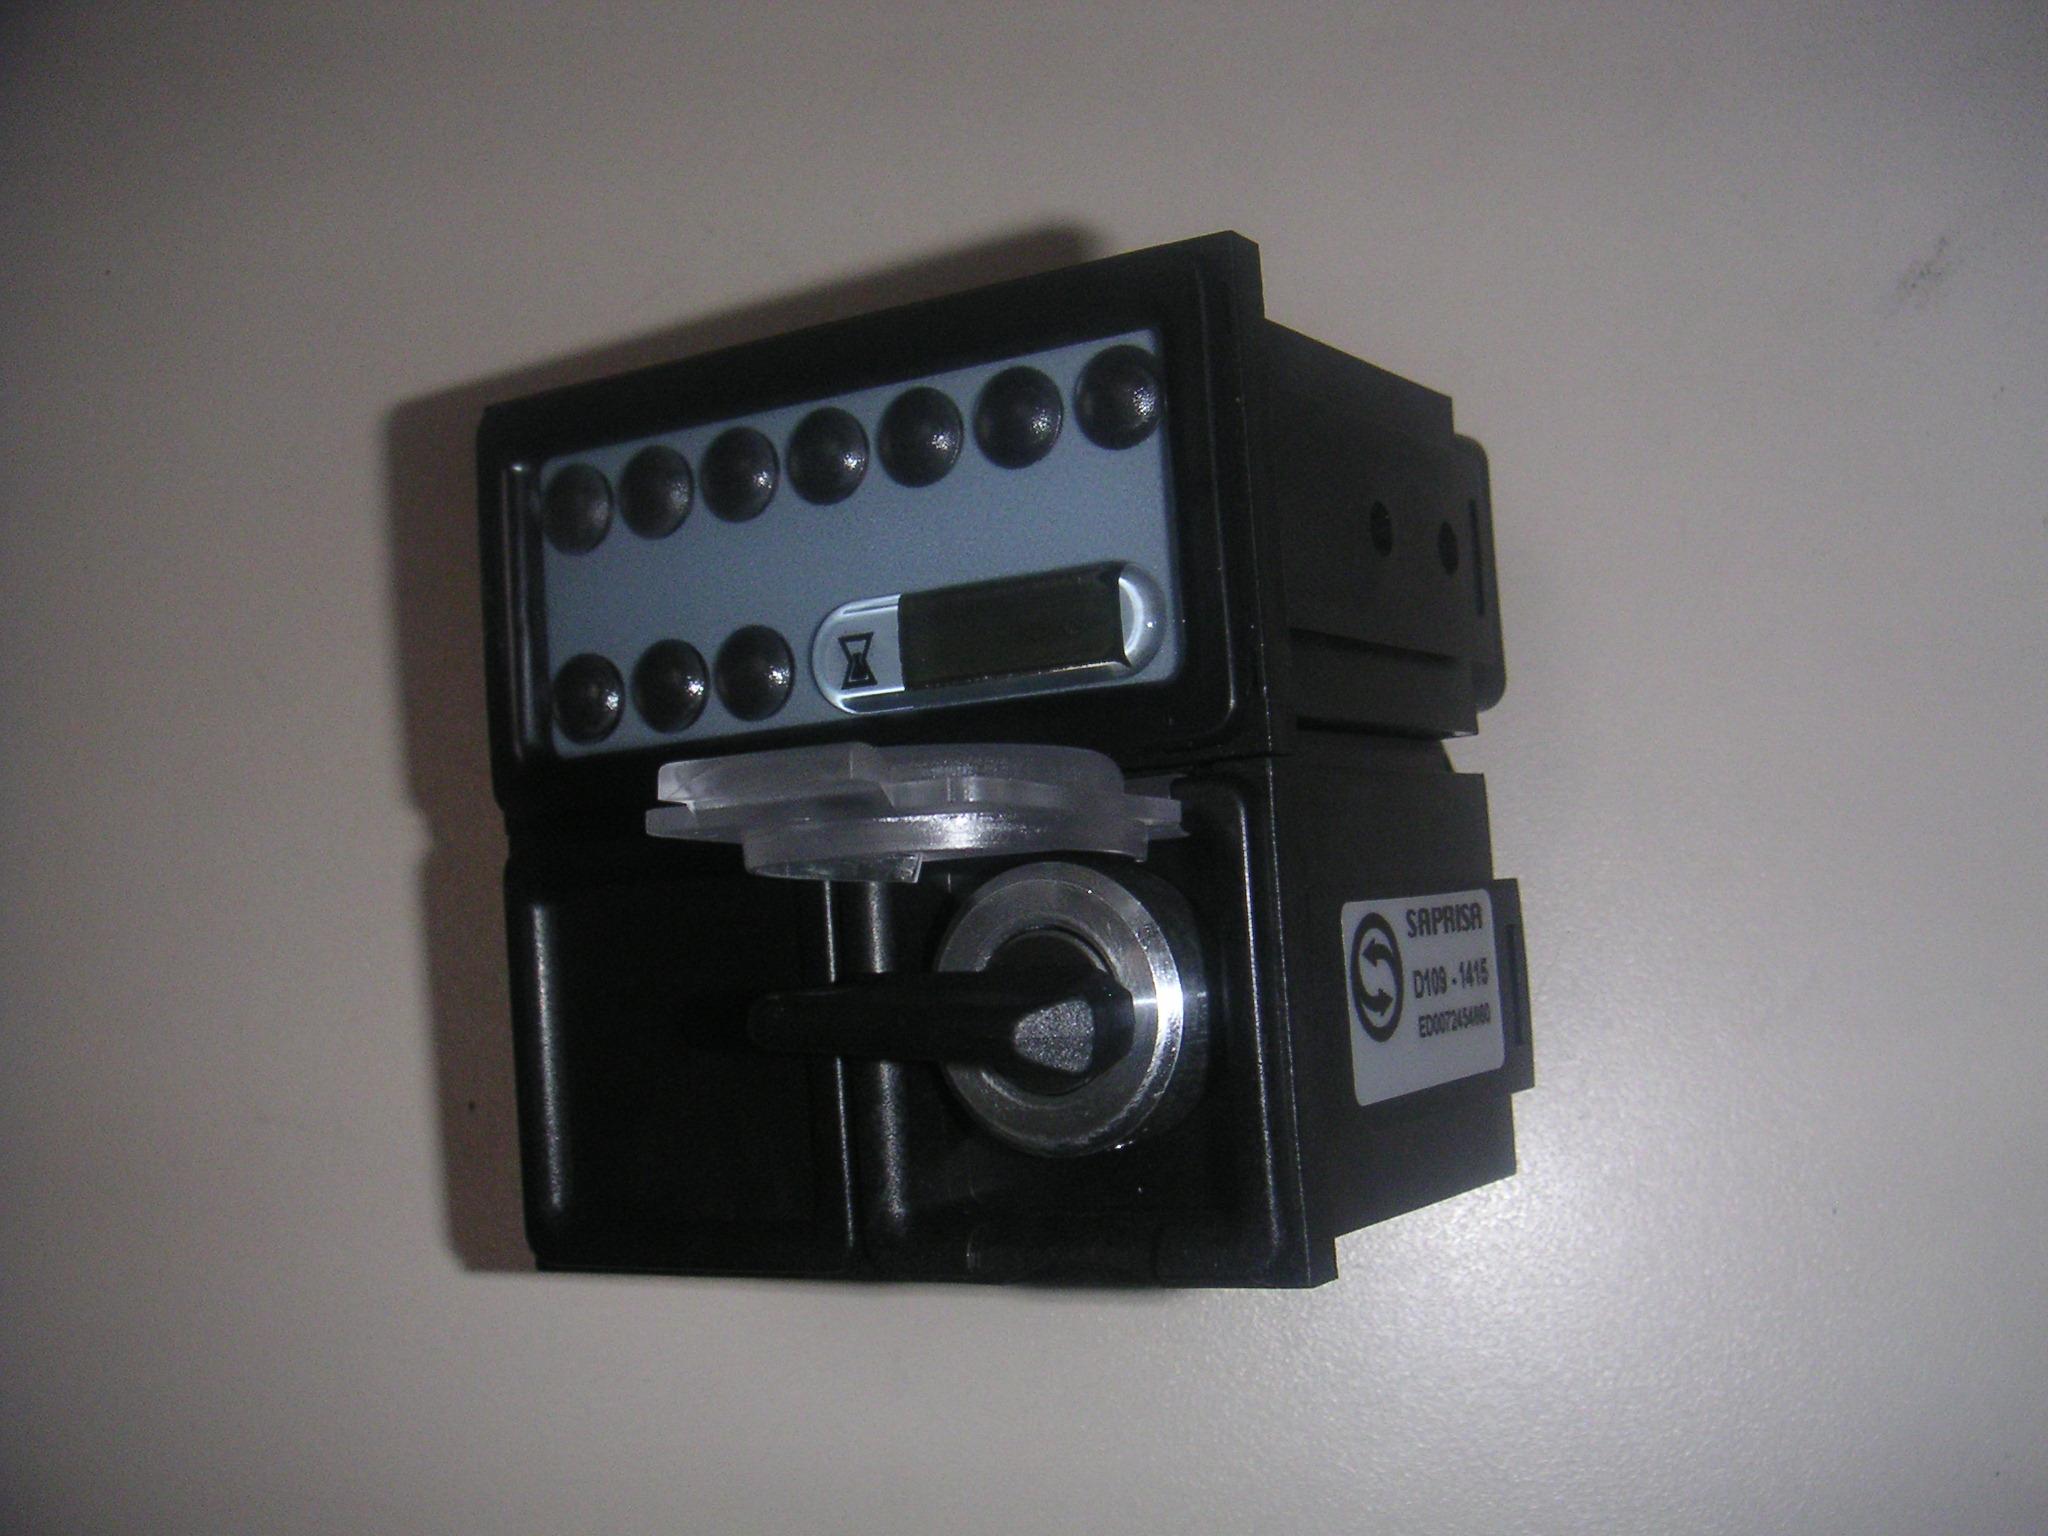 Lombardini Electrical Dashboard Saprisa D109 ED0072454660-S Kohler